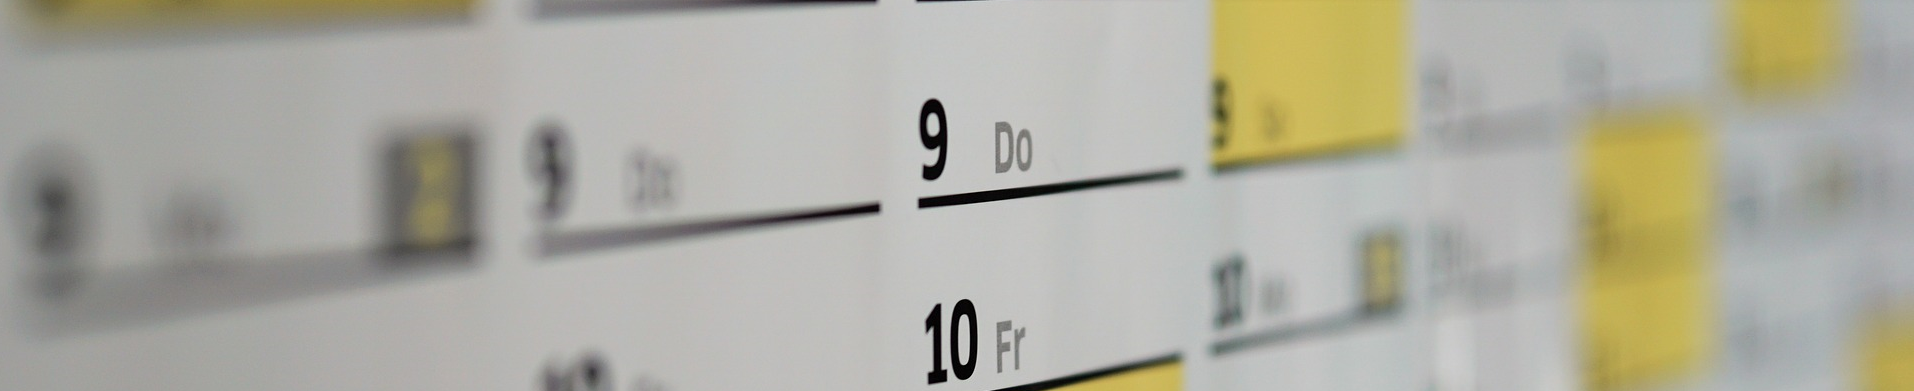 calendrier de formations Forsim